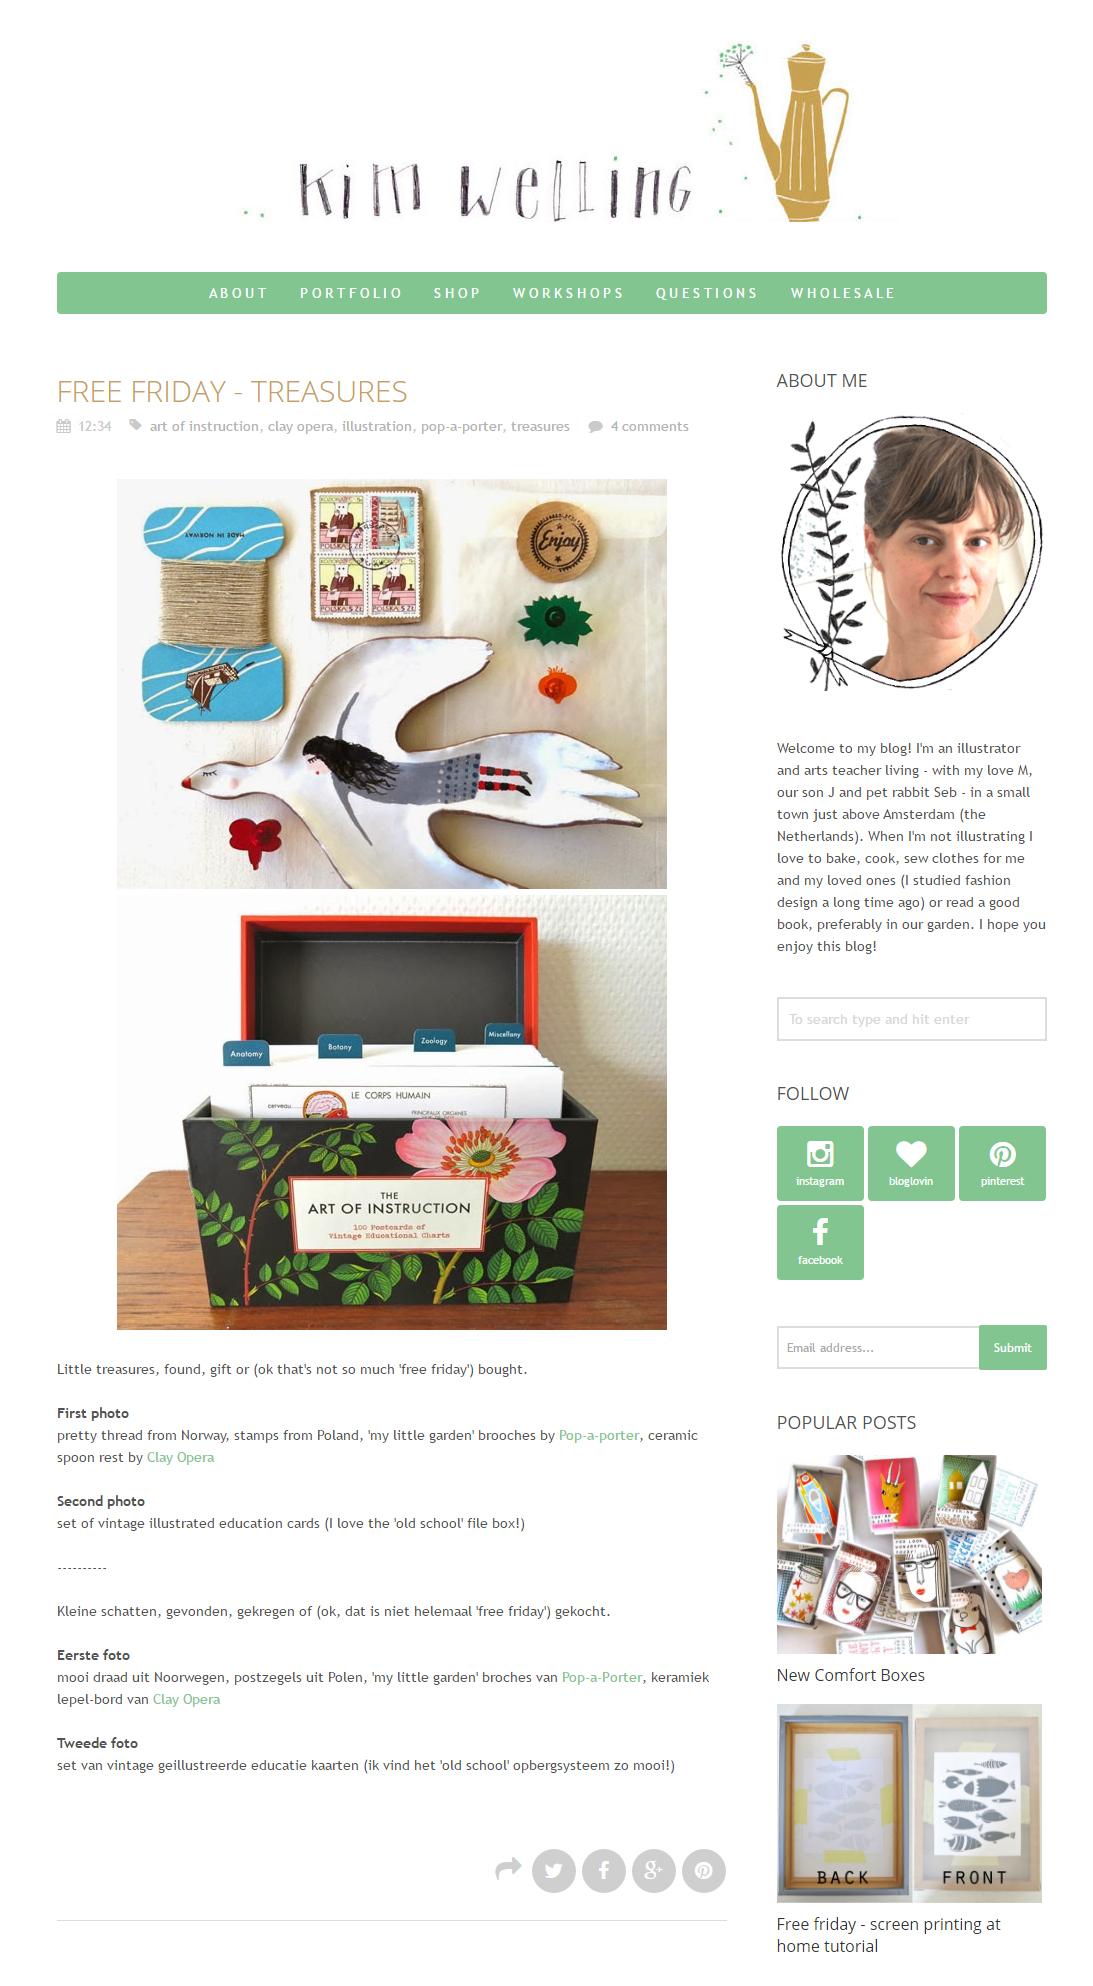 pop-a-porter's 'My little garden' acrylic brooches on Kim Welling blog